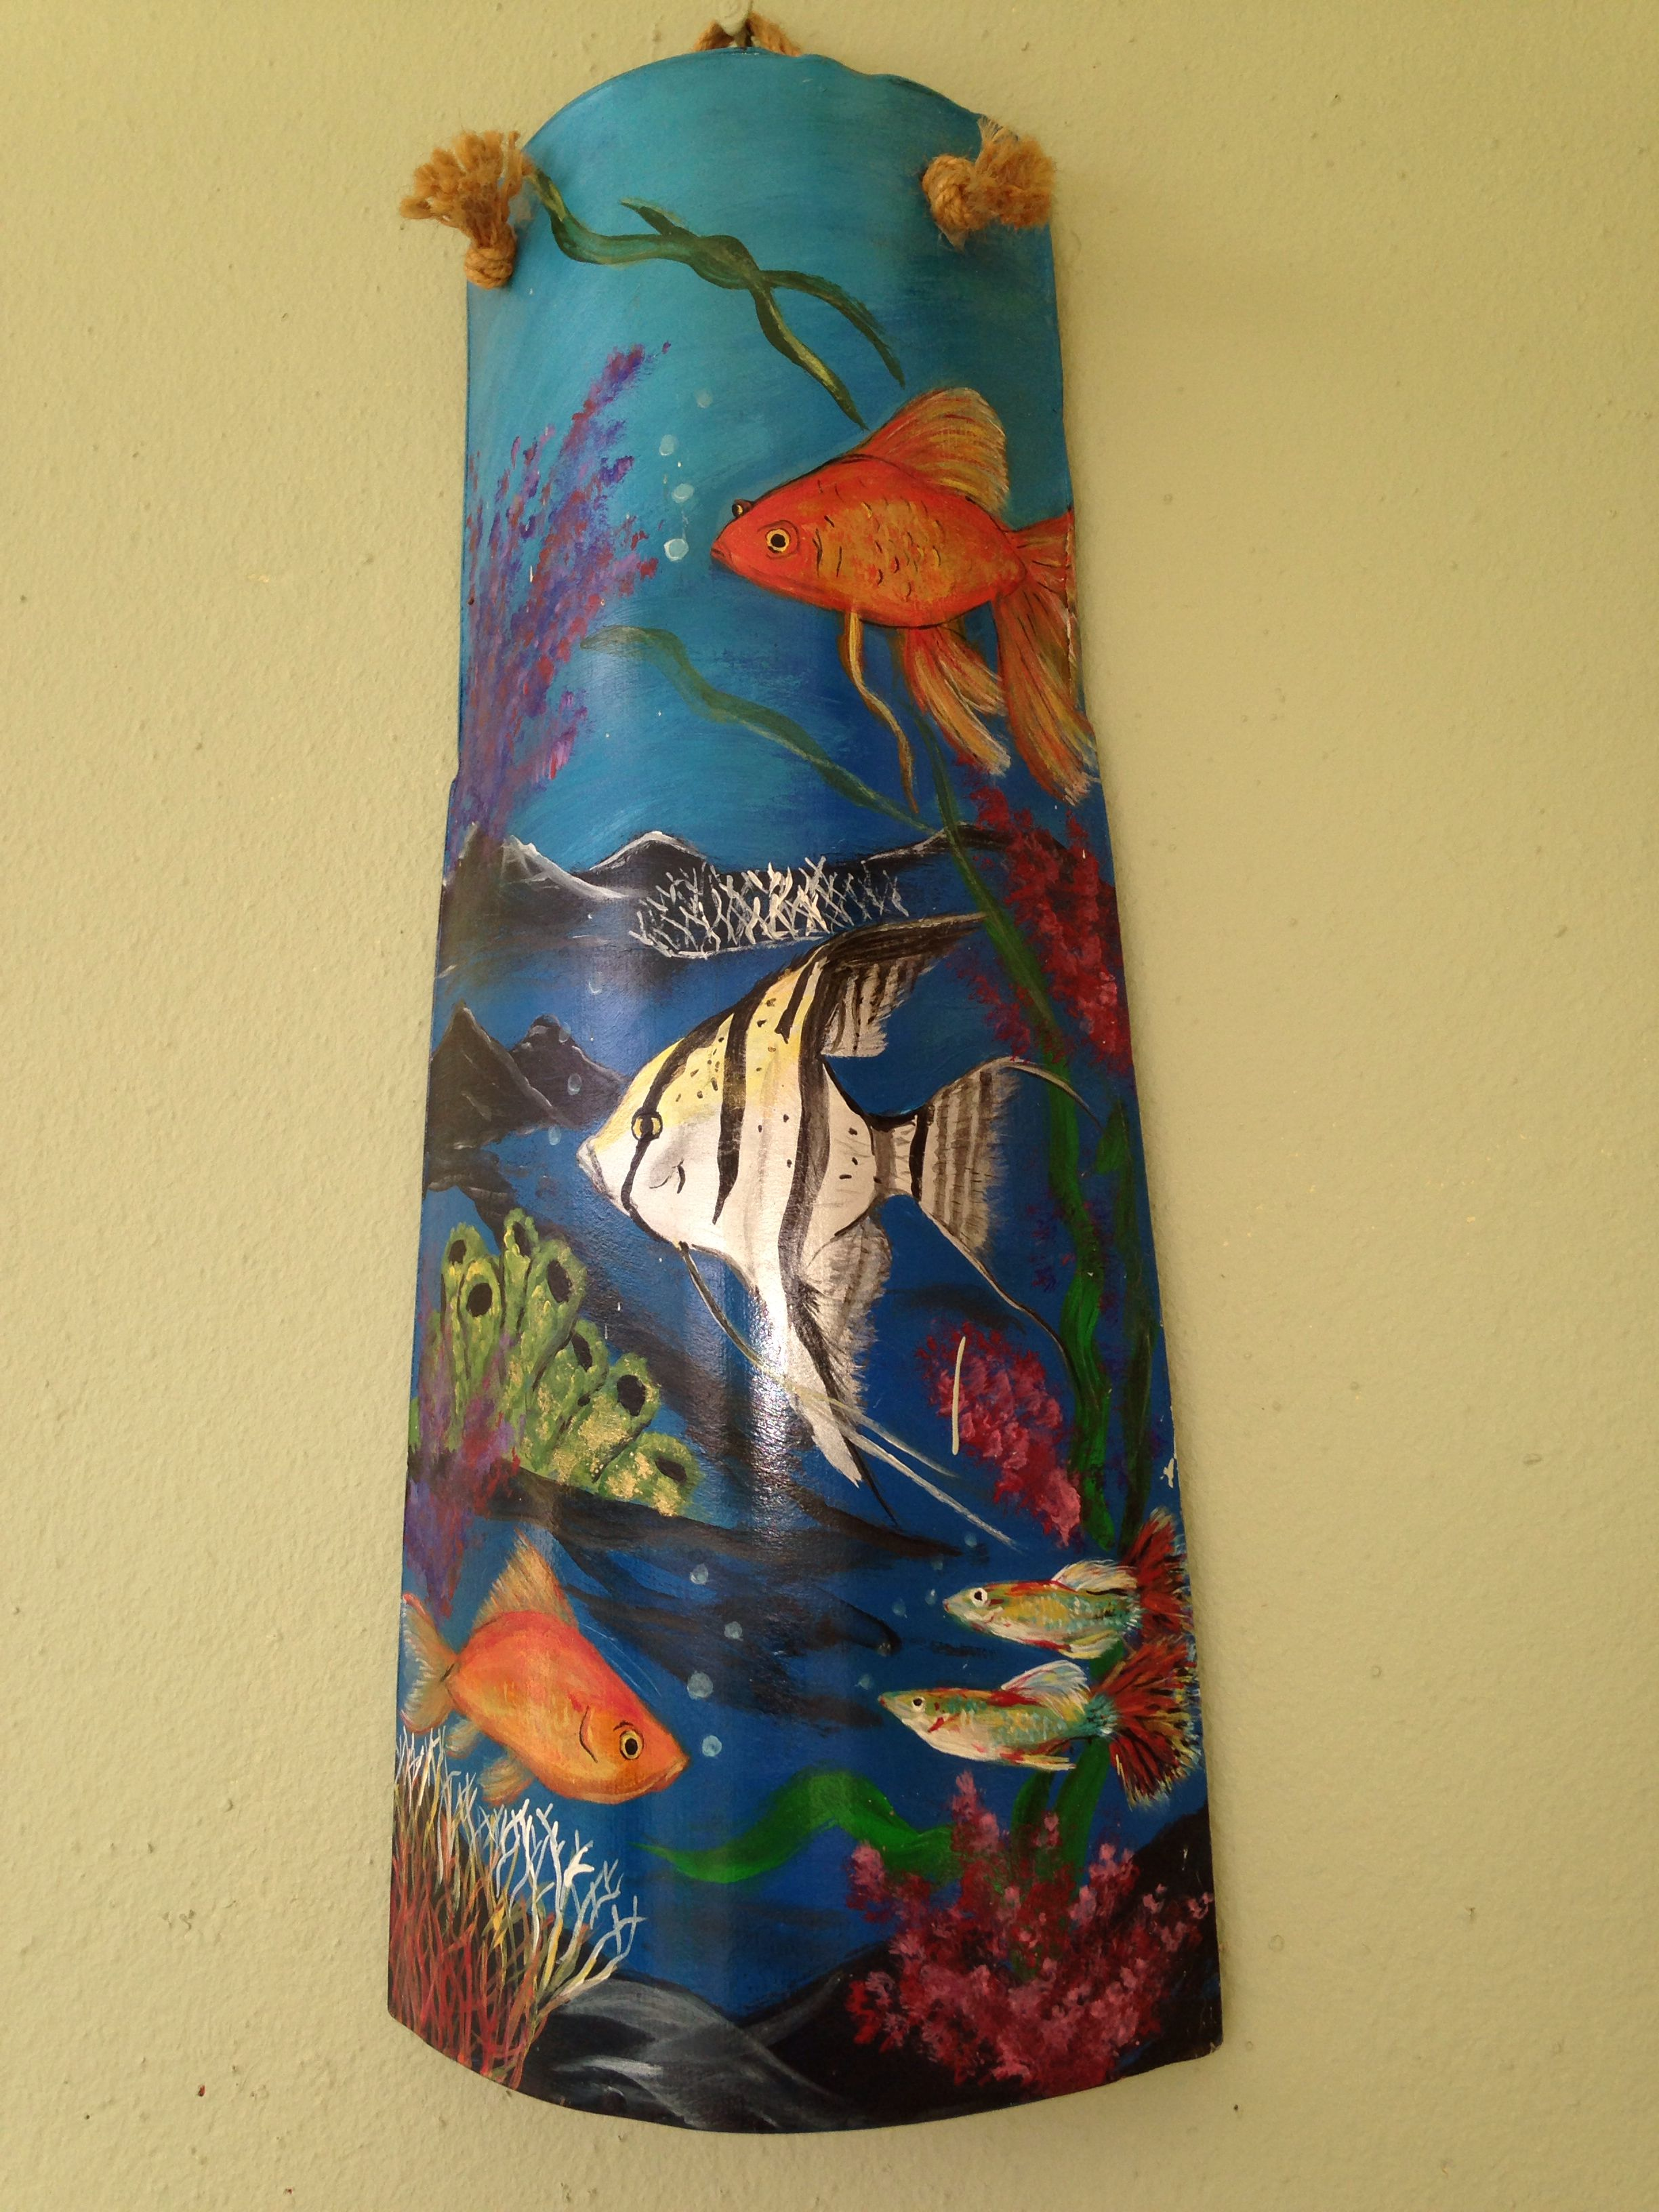 Fondo marino teja pintada en acr lico 2010 por elba rivera figueroa mi pasatiempo - Pintar tejas de barro ...